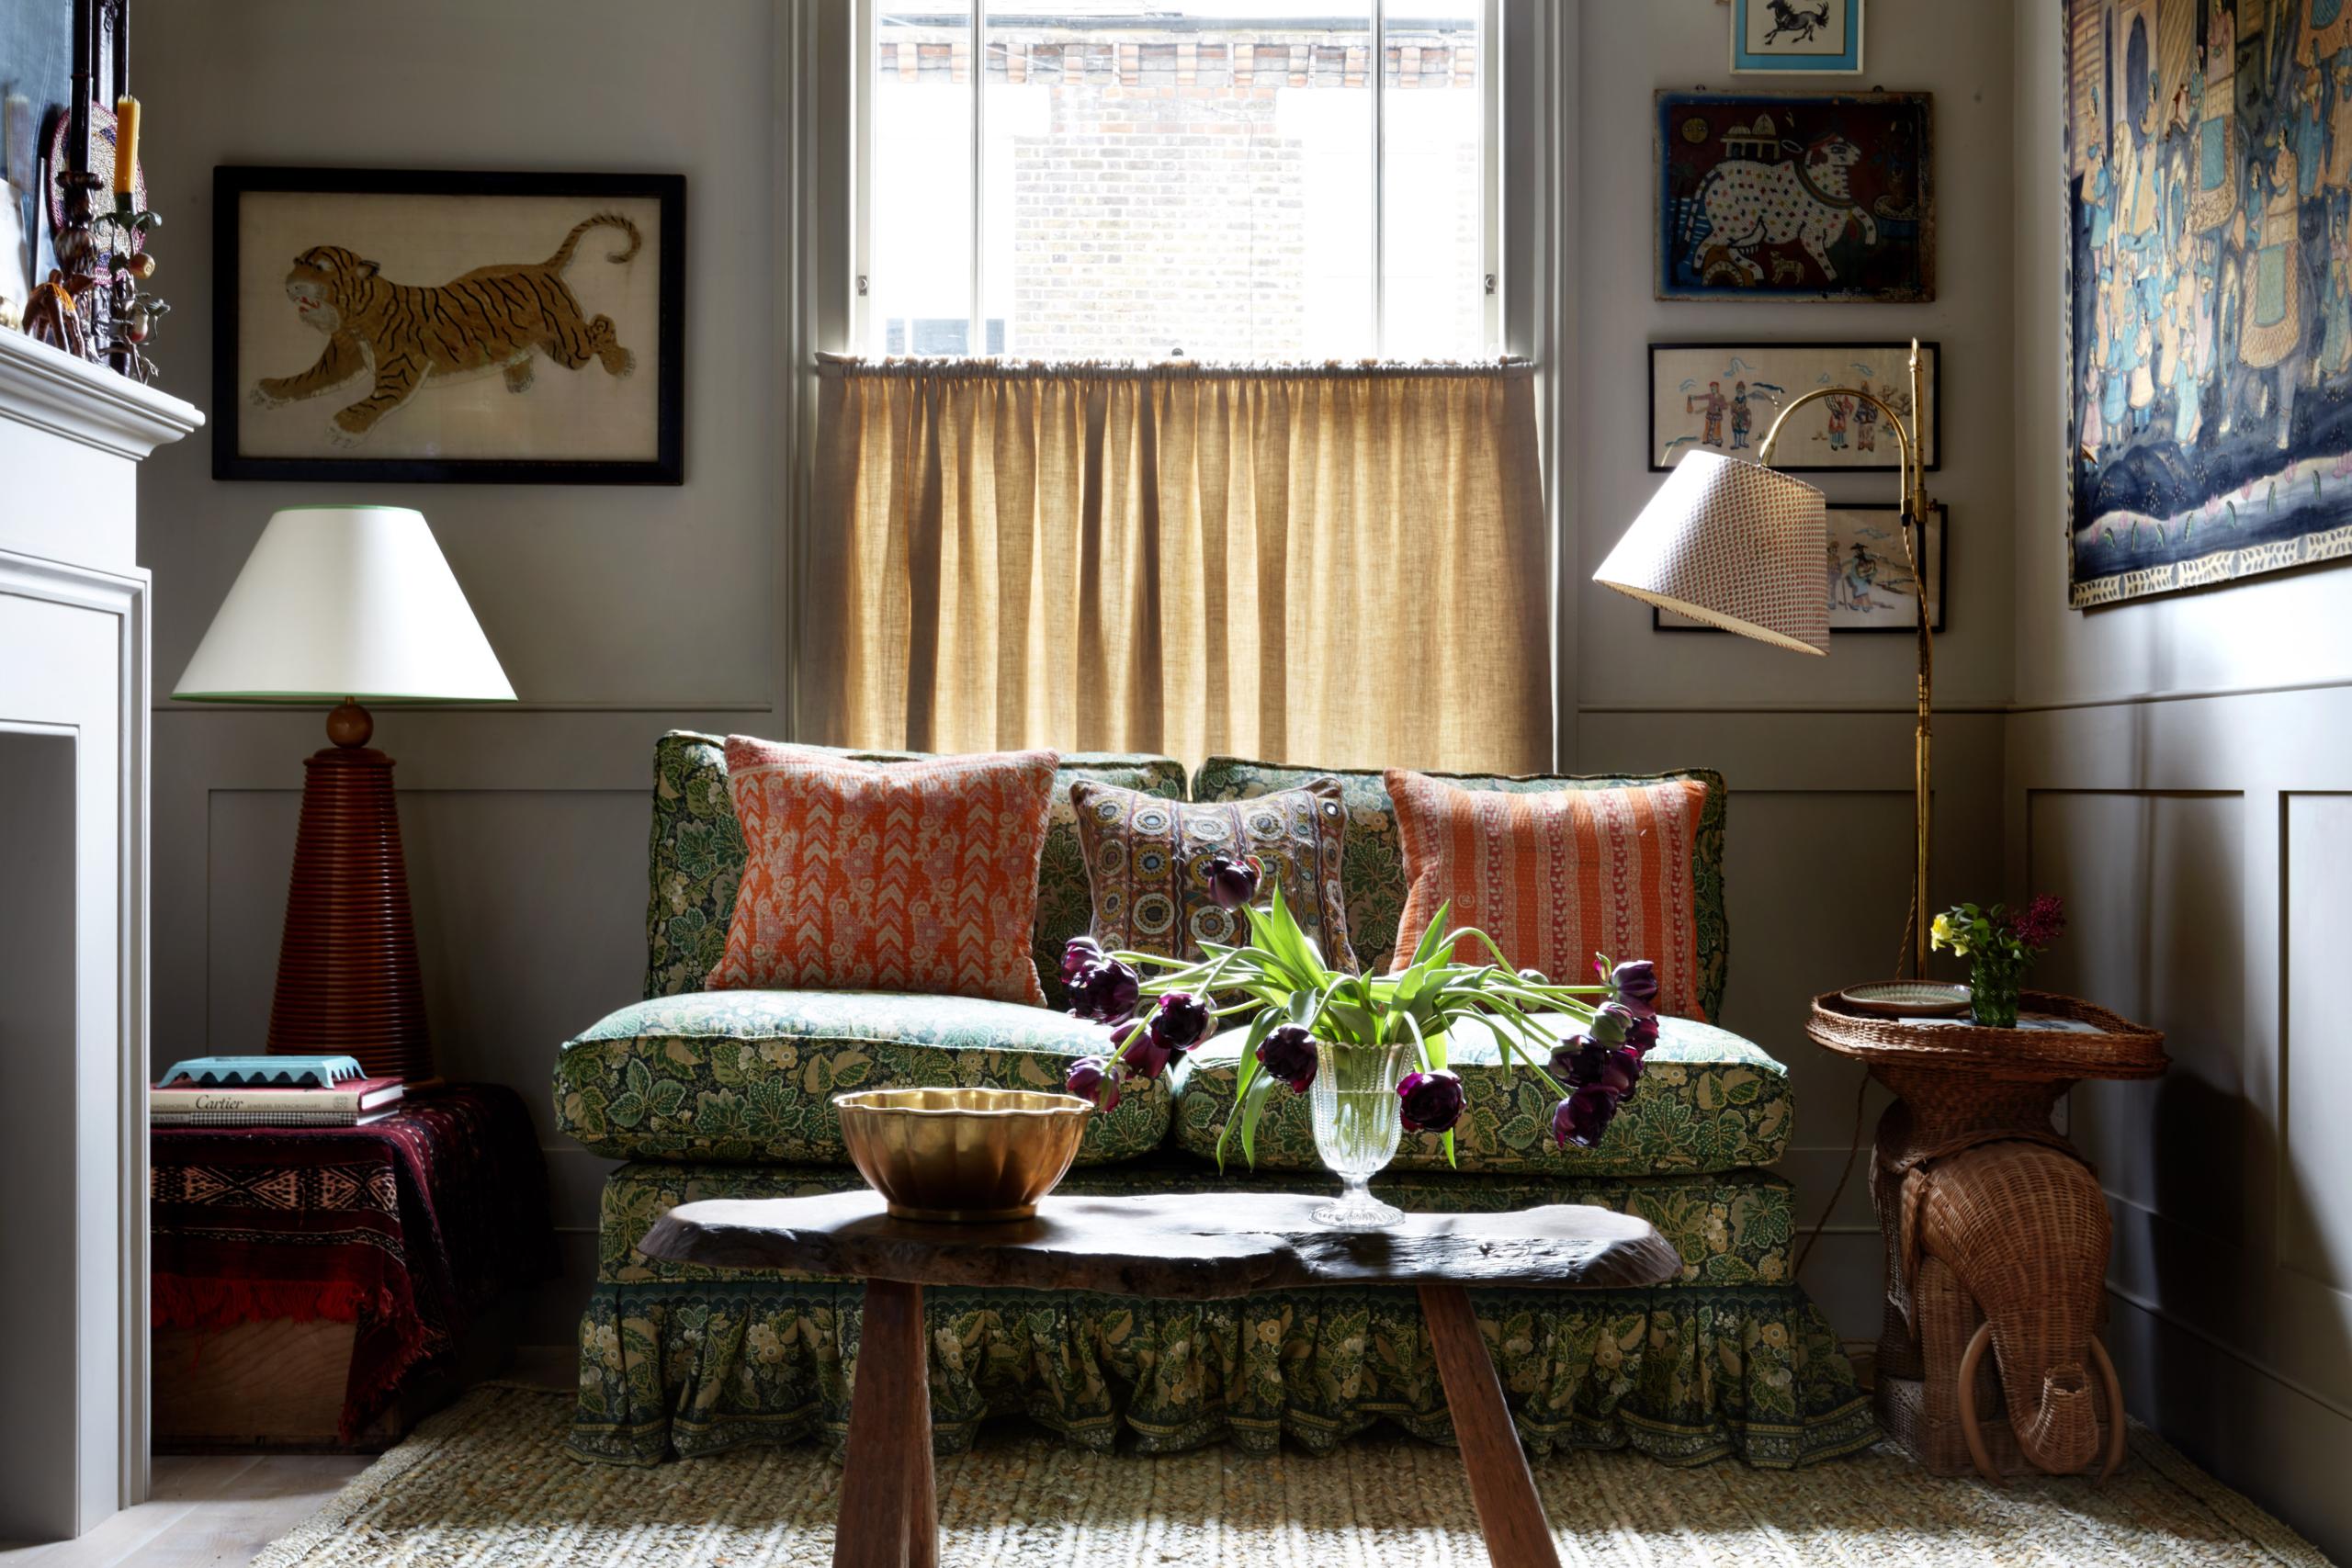 Urban Cozy: Interior Designer Lonika Chande's West London Cottage